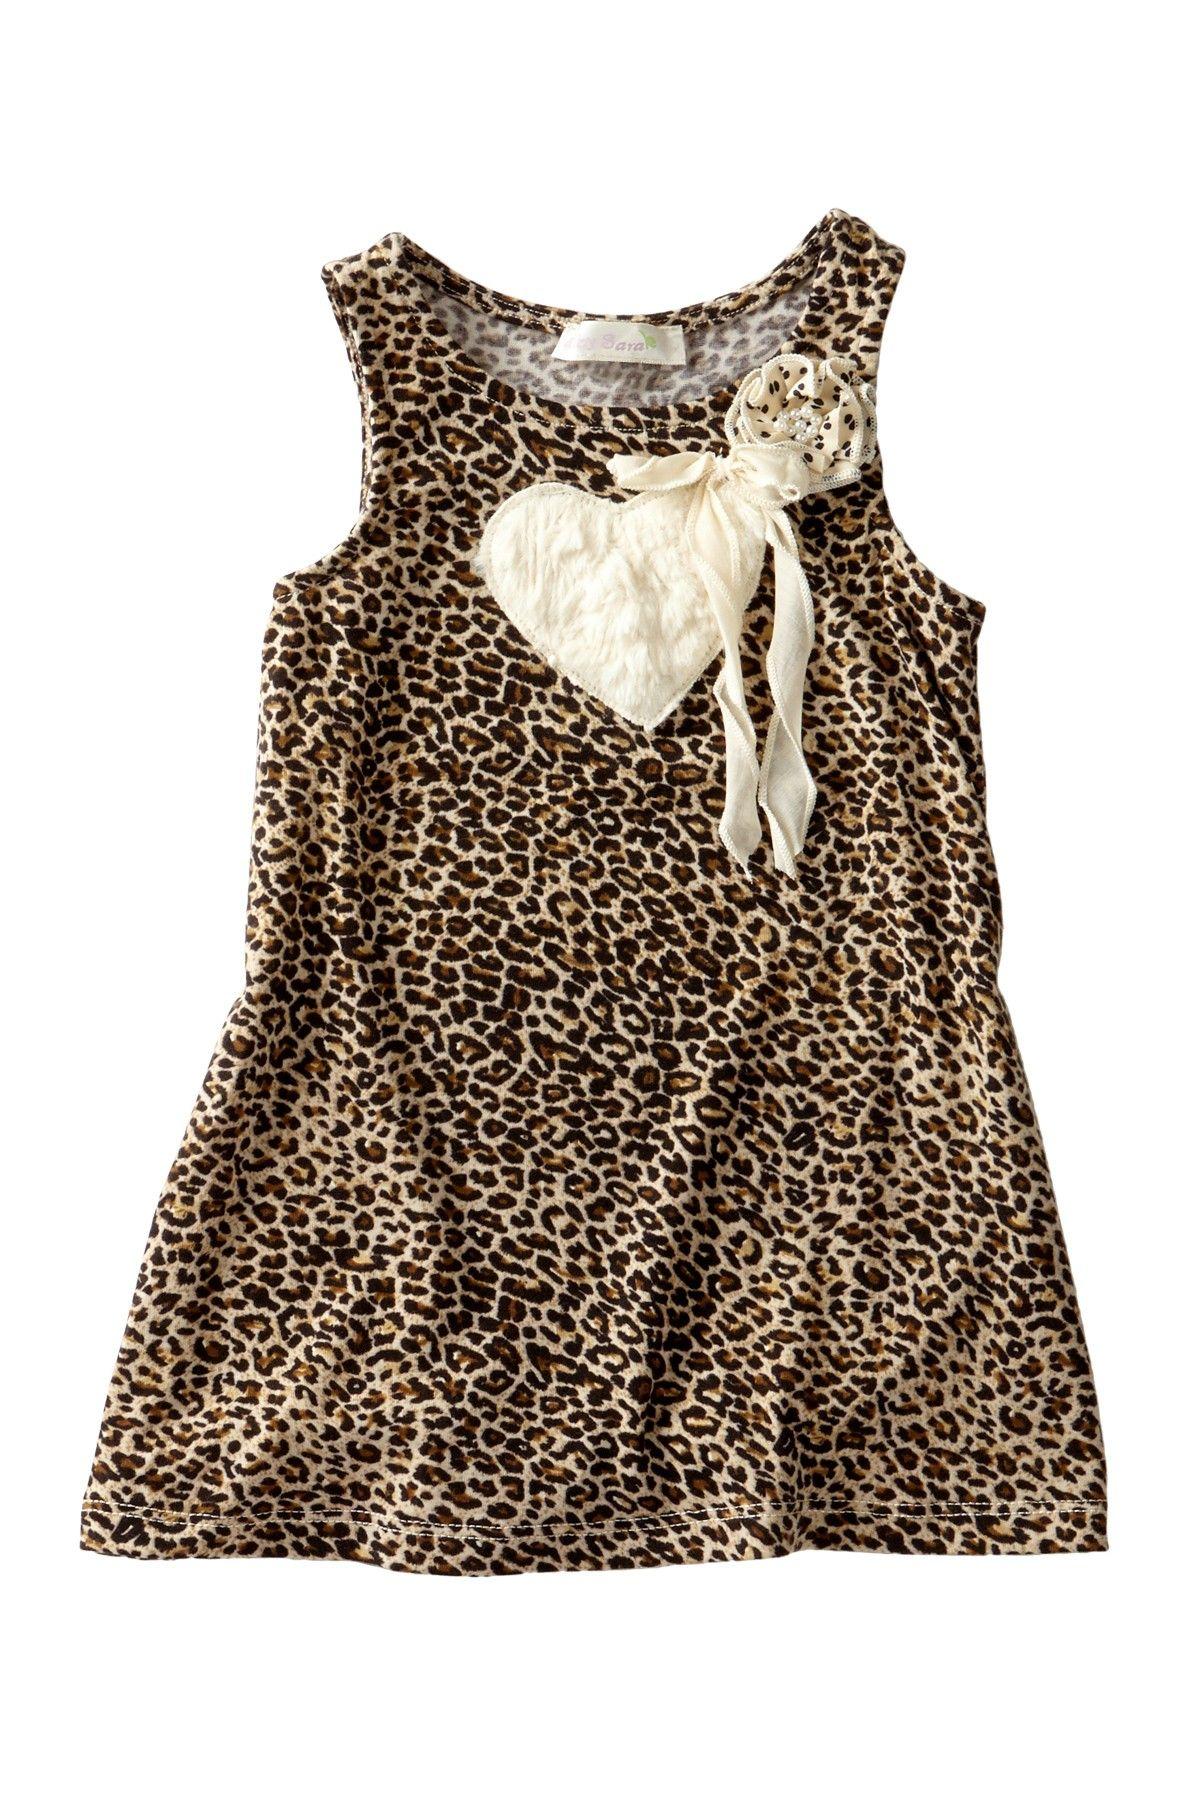 aca8460e4 Animal Print Dress (Baby, Toddler, & Little Girls) | For my Tiggy ...